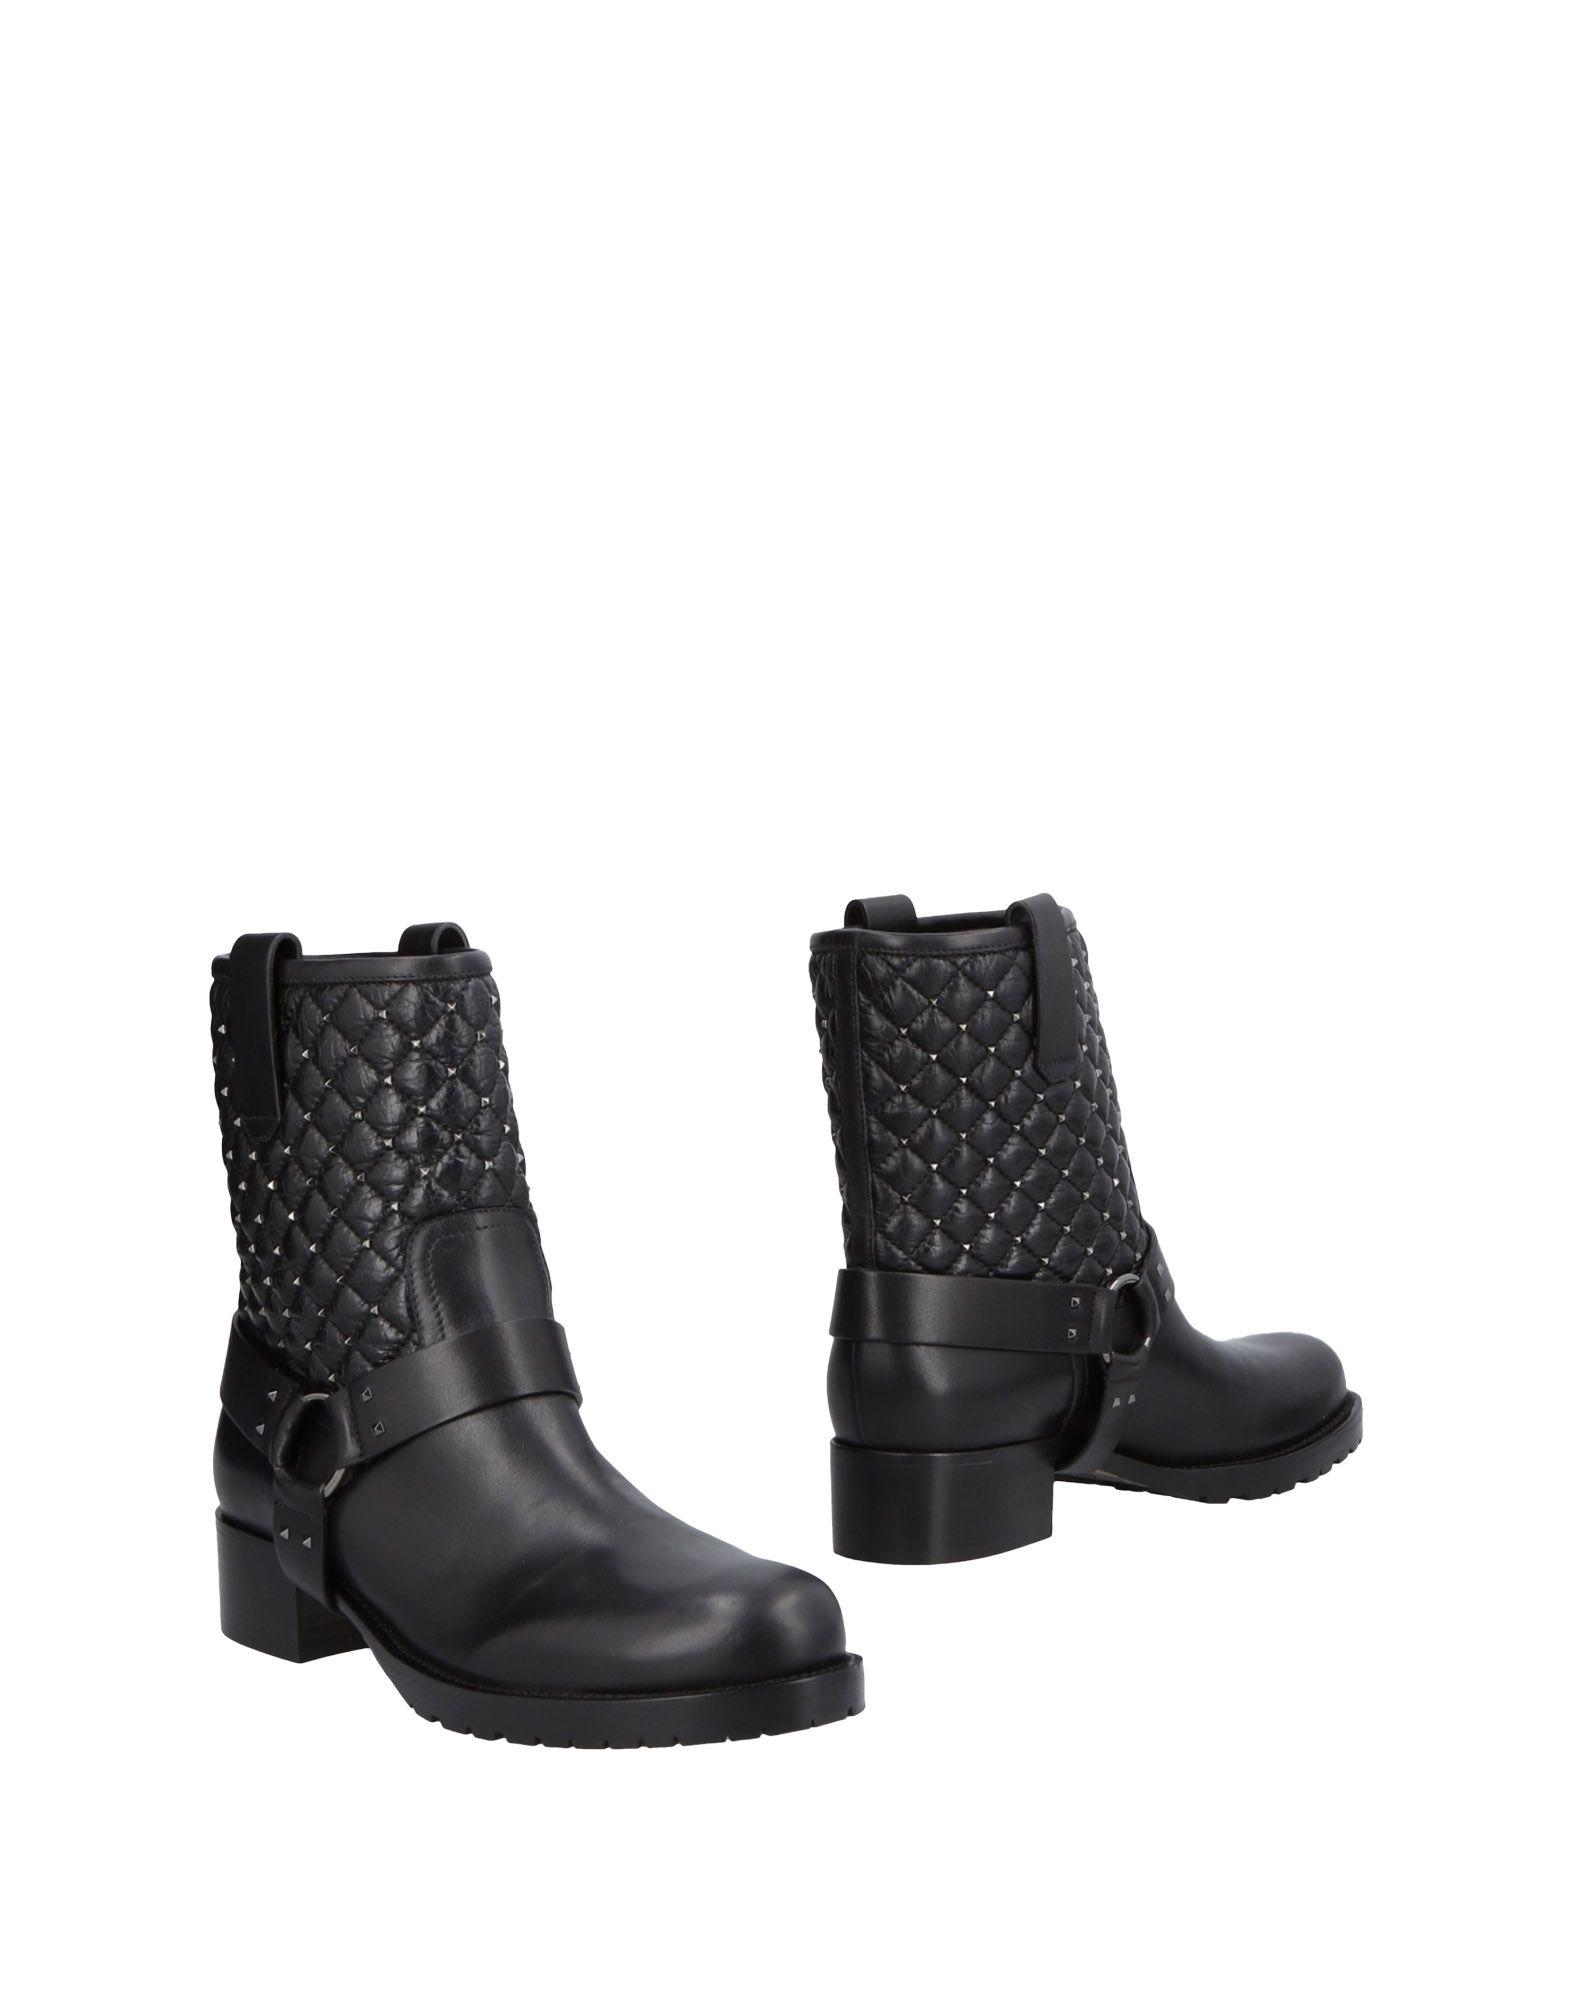 Valentino Garavani Ankle Boot - Women Valentino Garavani Ankle Boots - online on  Canada - Boots 11482012OF 8a66e9